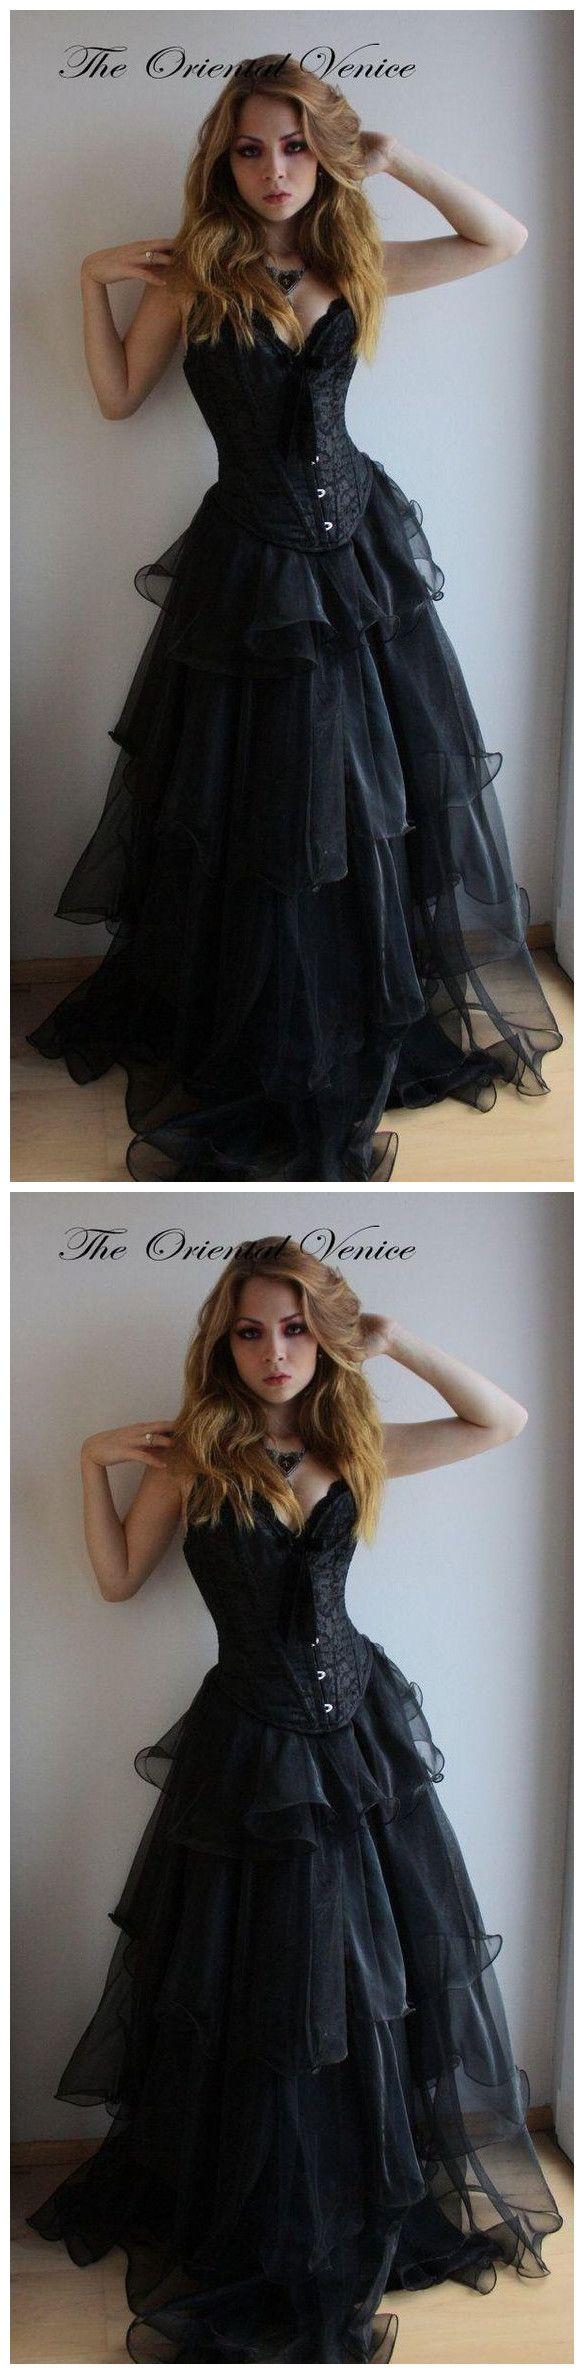 Elegant prom dressesblack gothic corset prom dresses sweetheart